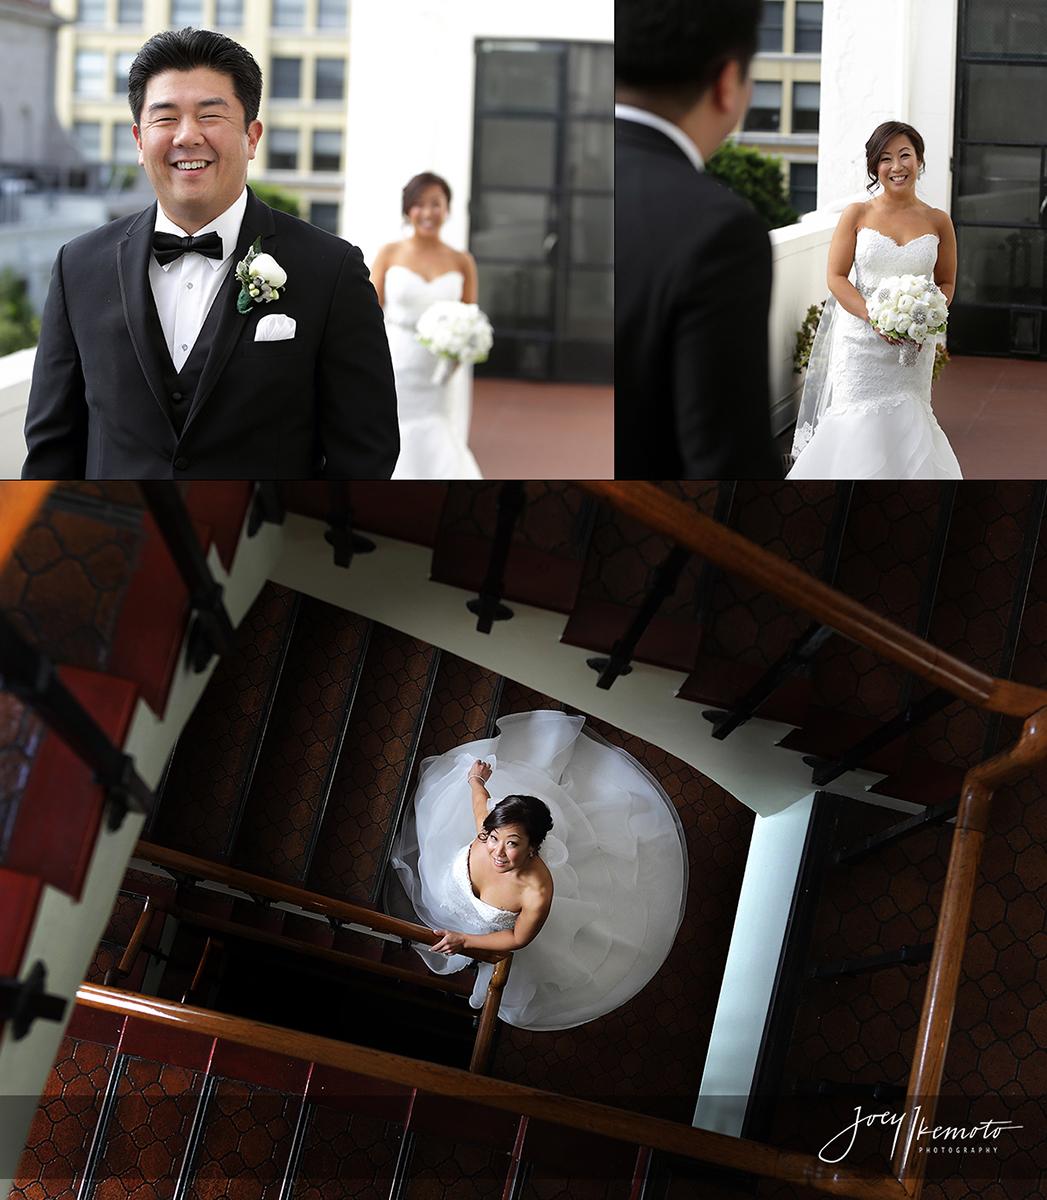 Vibiana-Los-Angeles-Weddings_0010_Blog-Collage-1452302789068